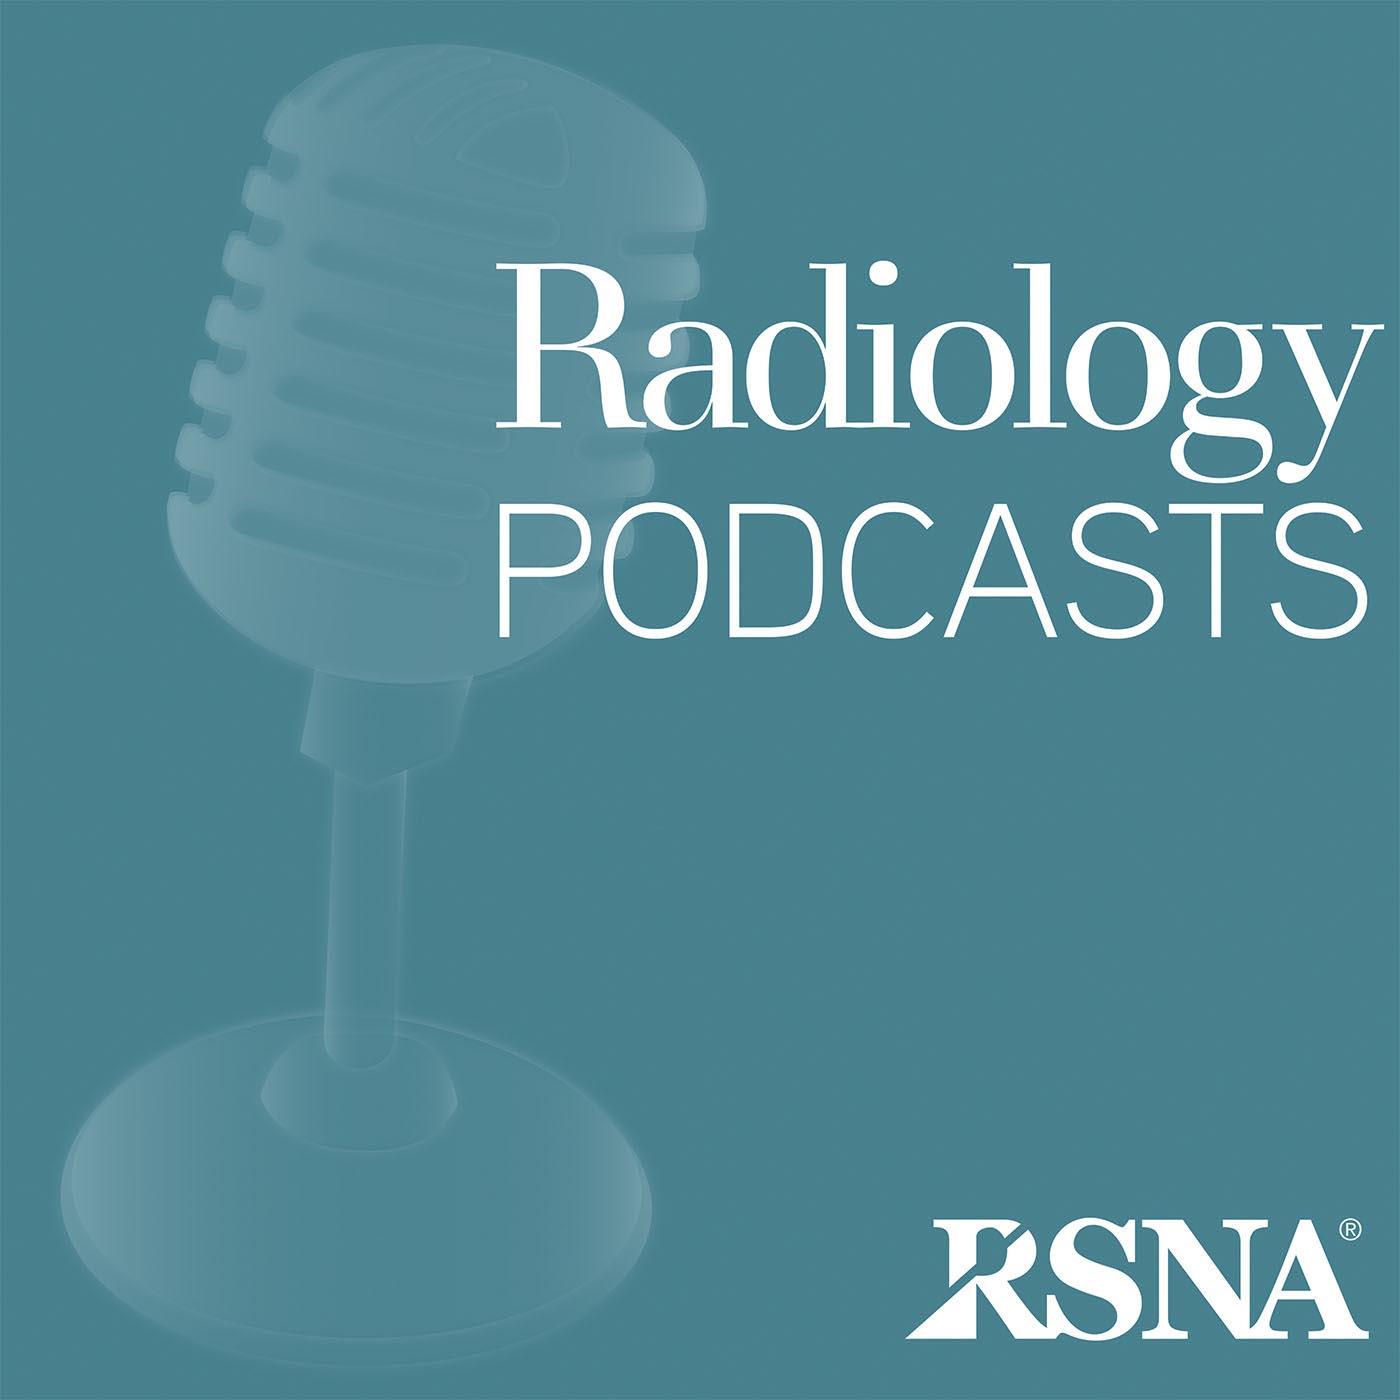 Radiology Podcasts | RSNA show art